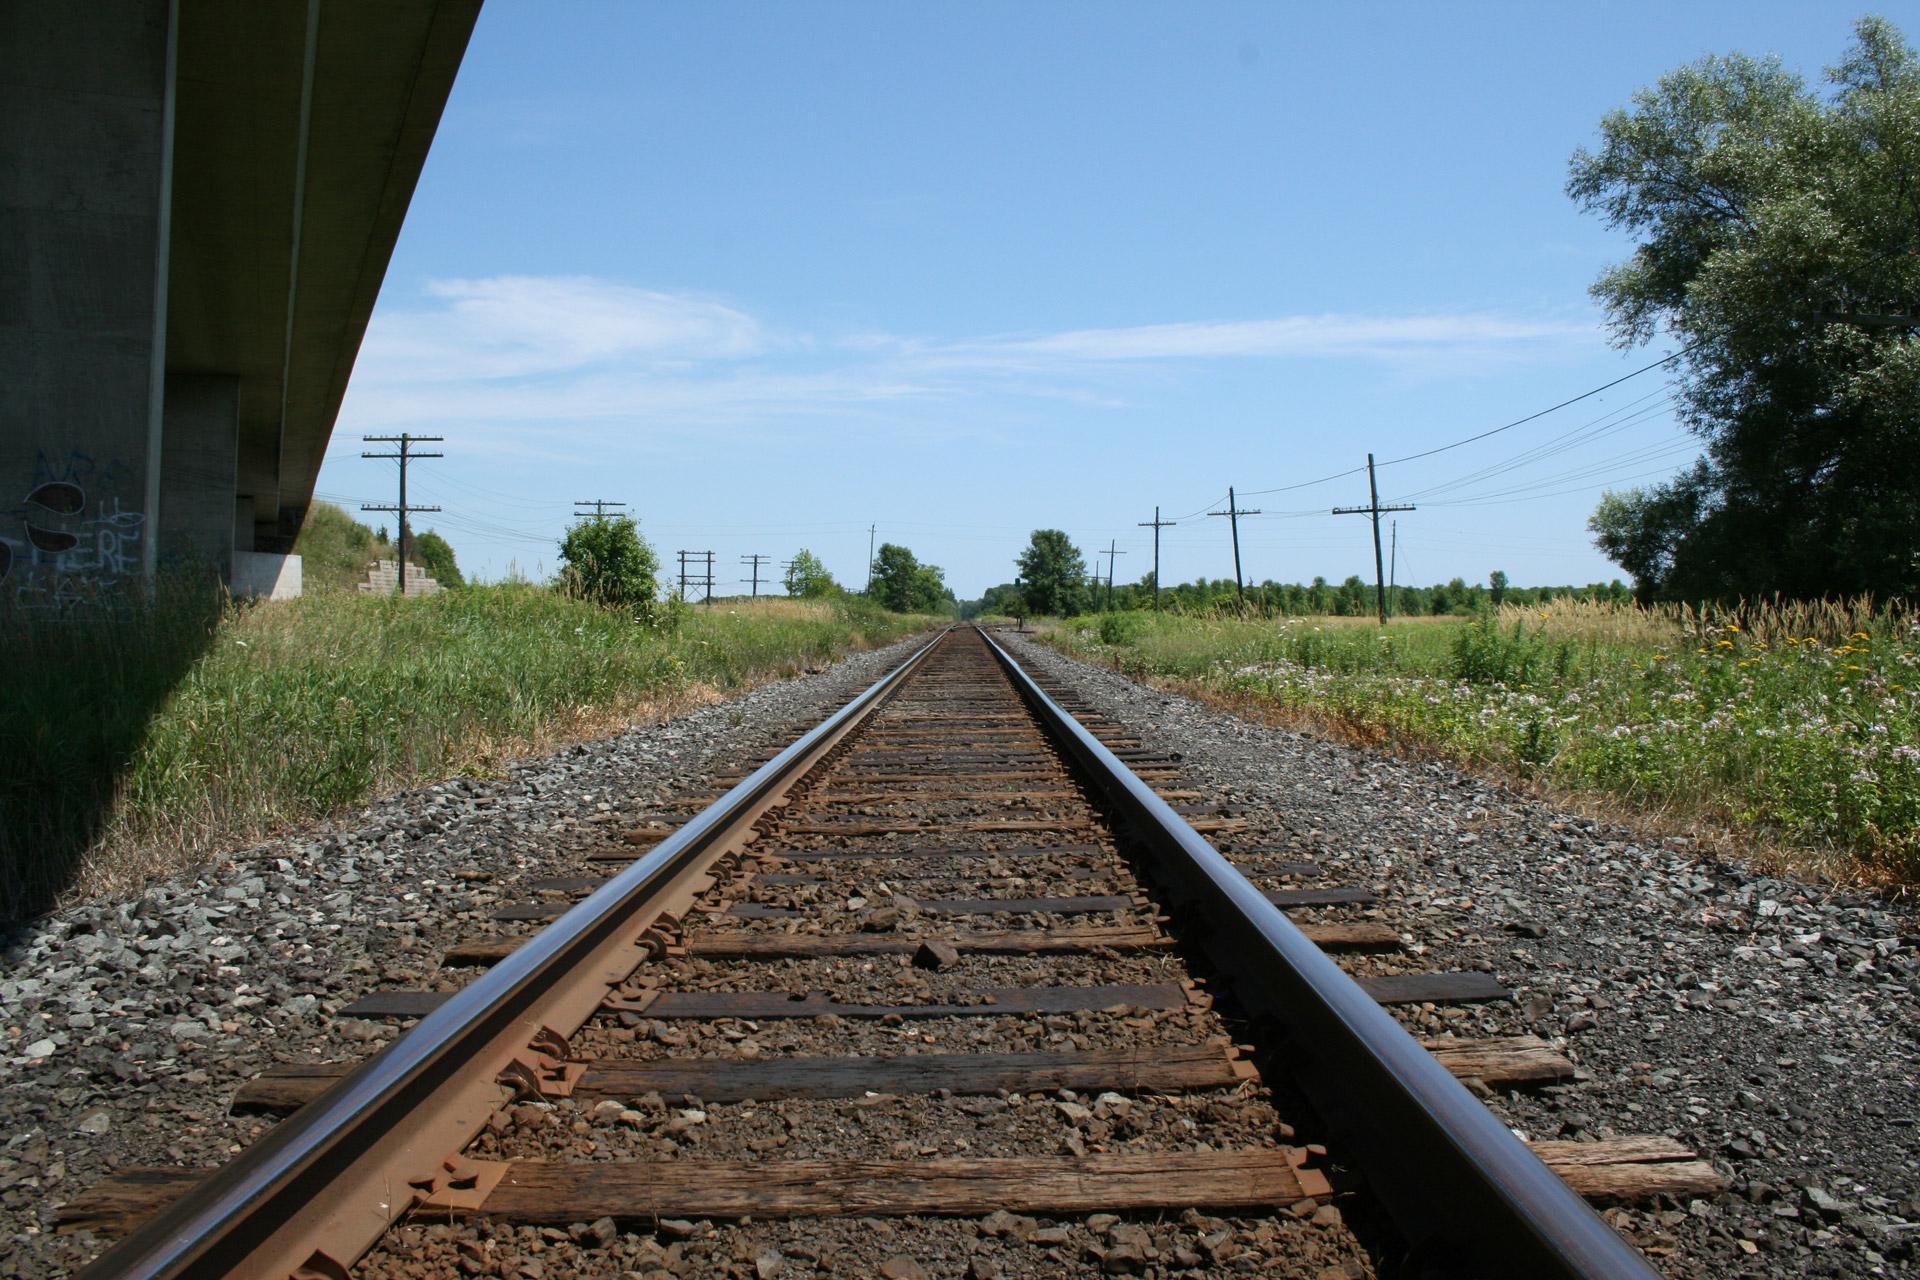 Train Tracks Free Stock Photo - Public Domain Pictures